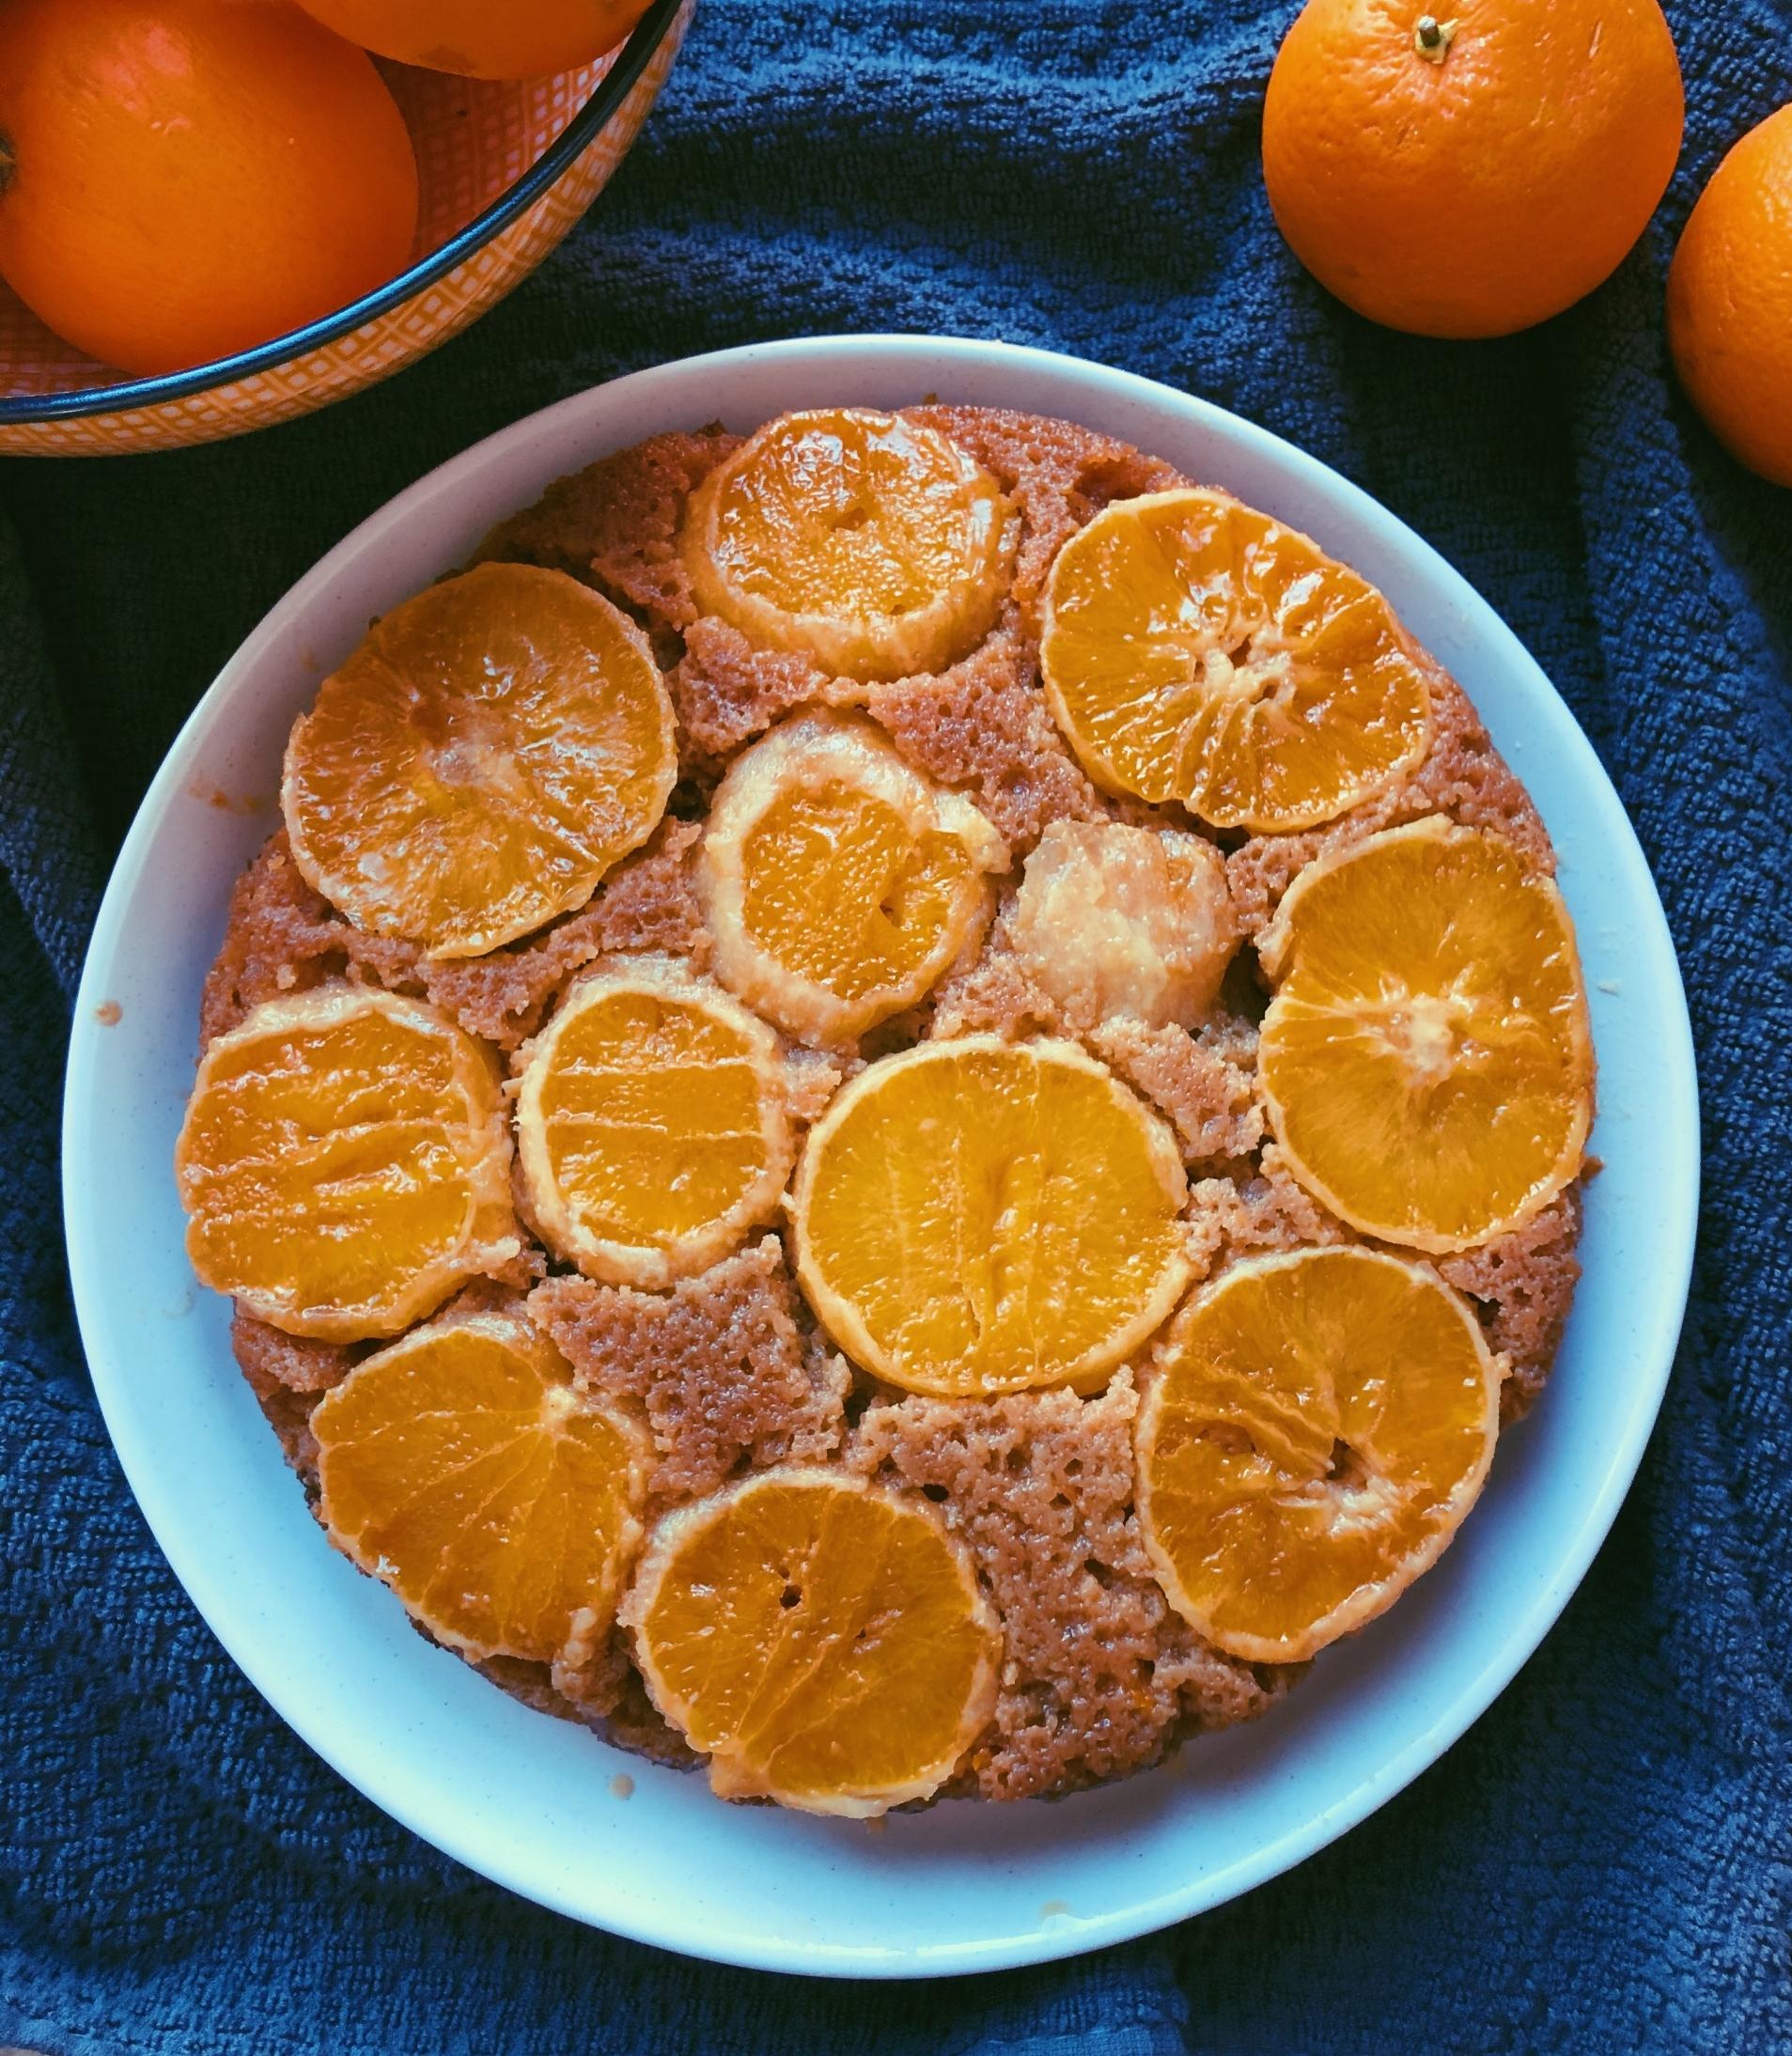 orange upside down cake with coconut flour grain free, scd diet)